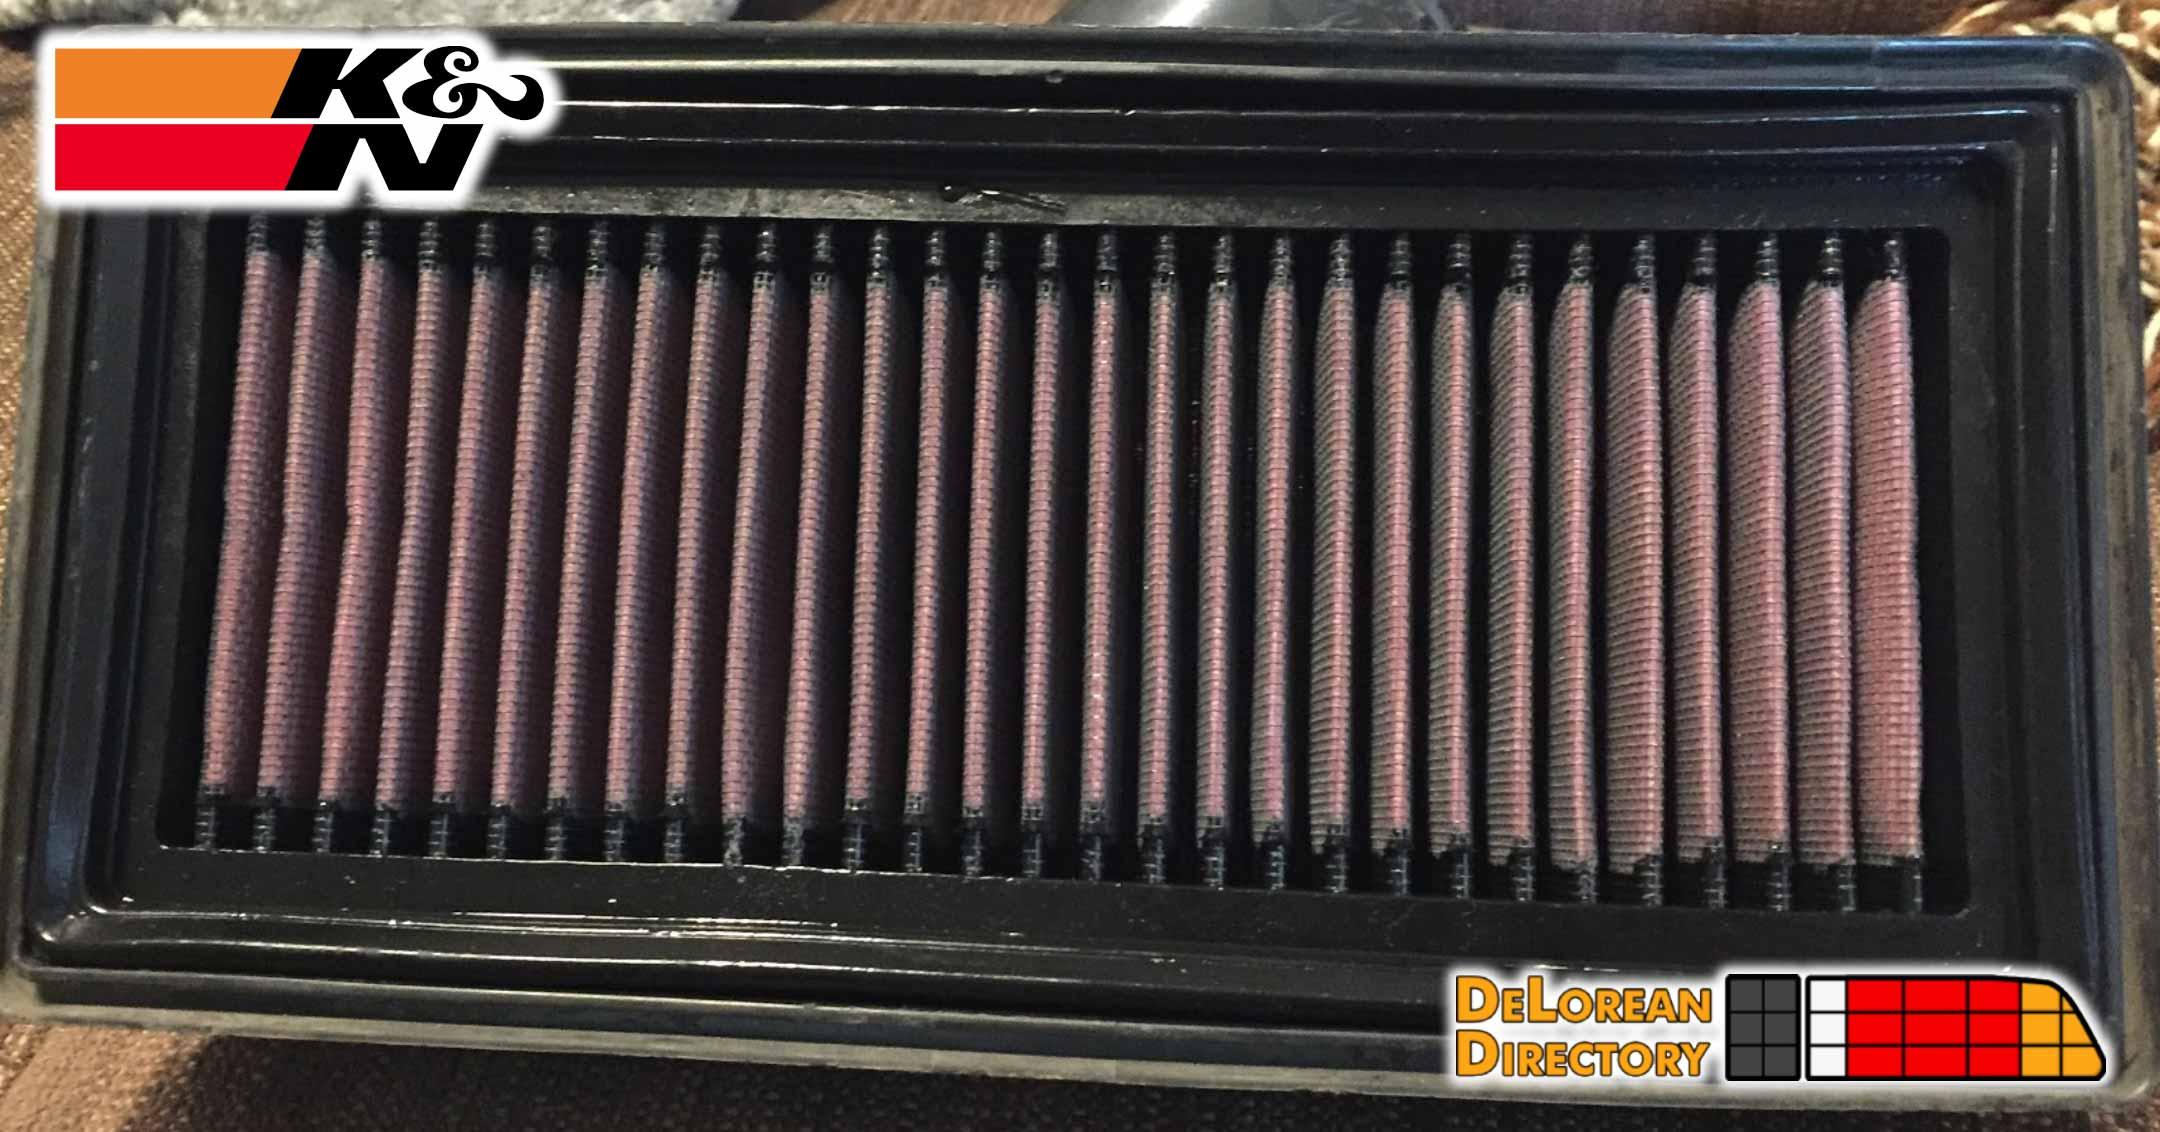 Air Filter Update | DeLoreanDirectory.com